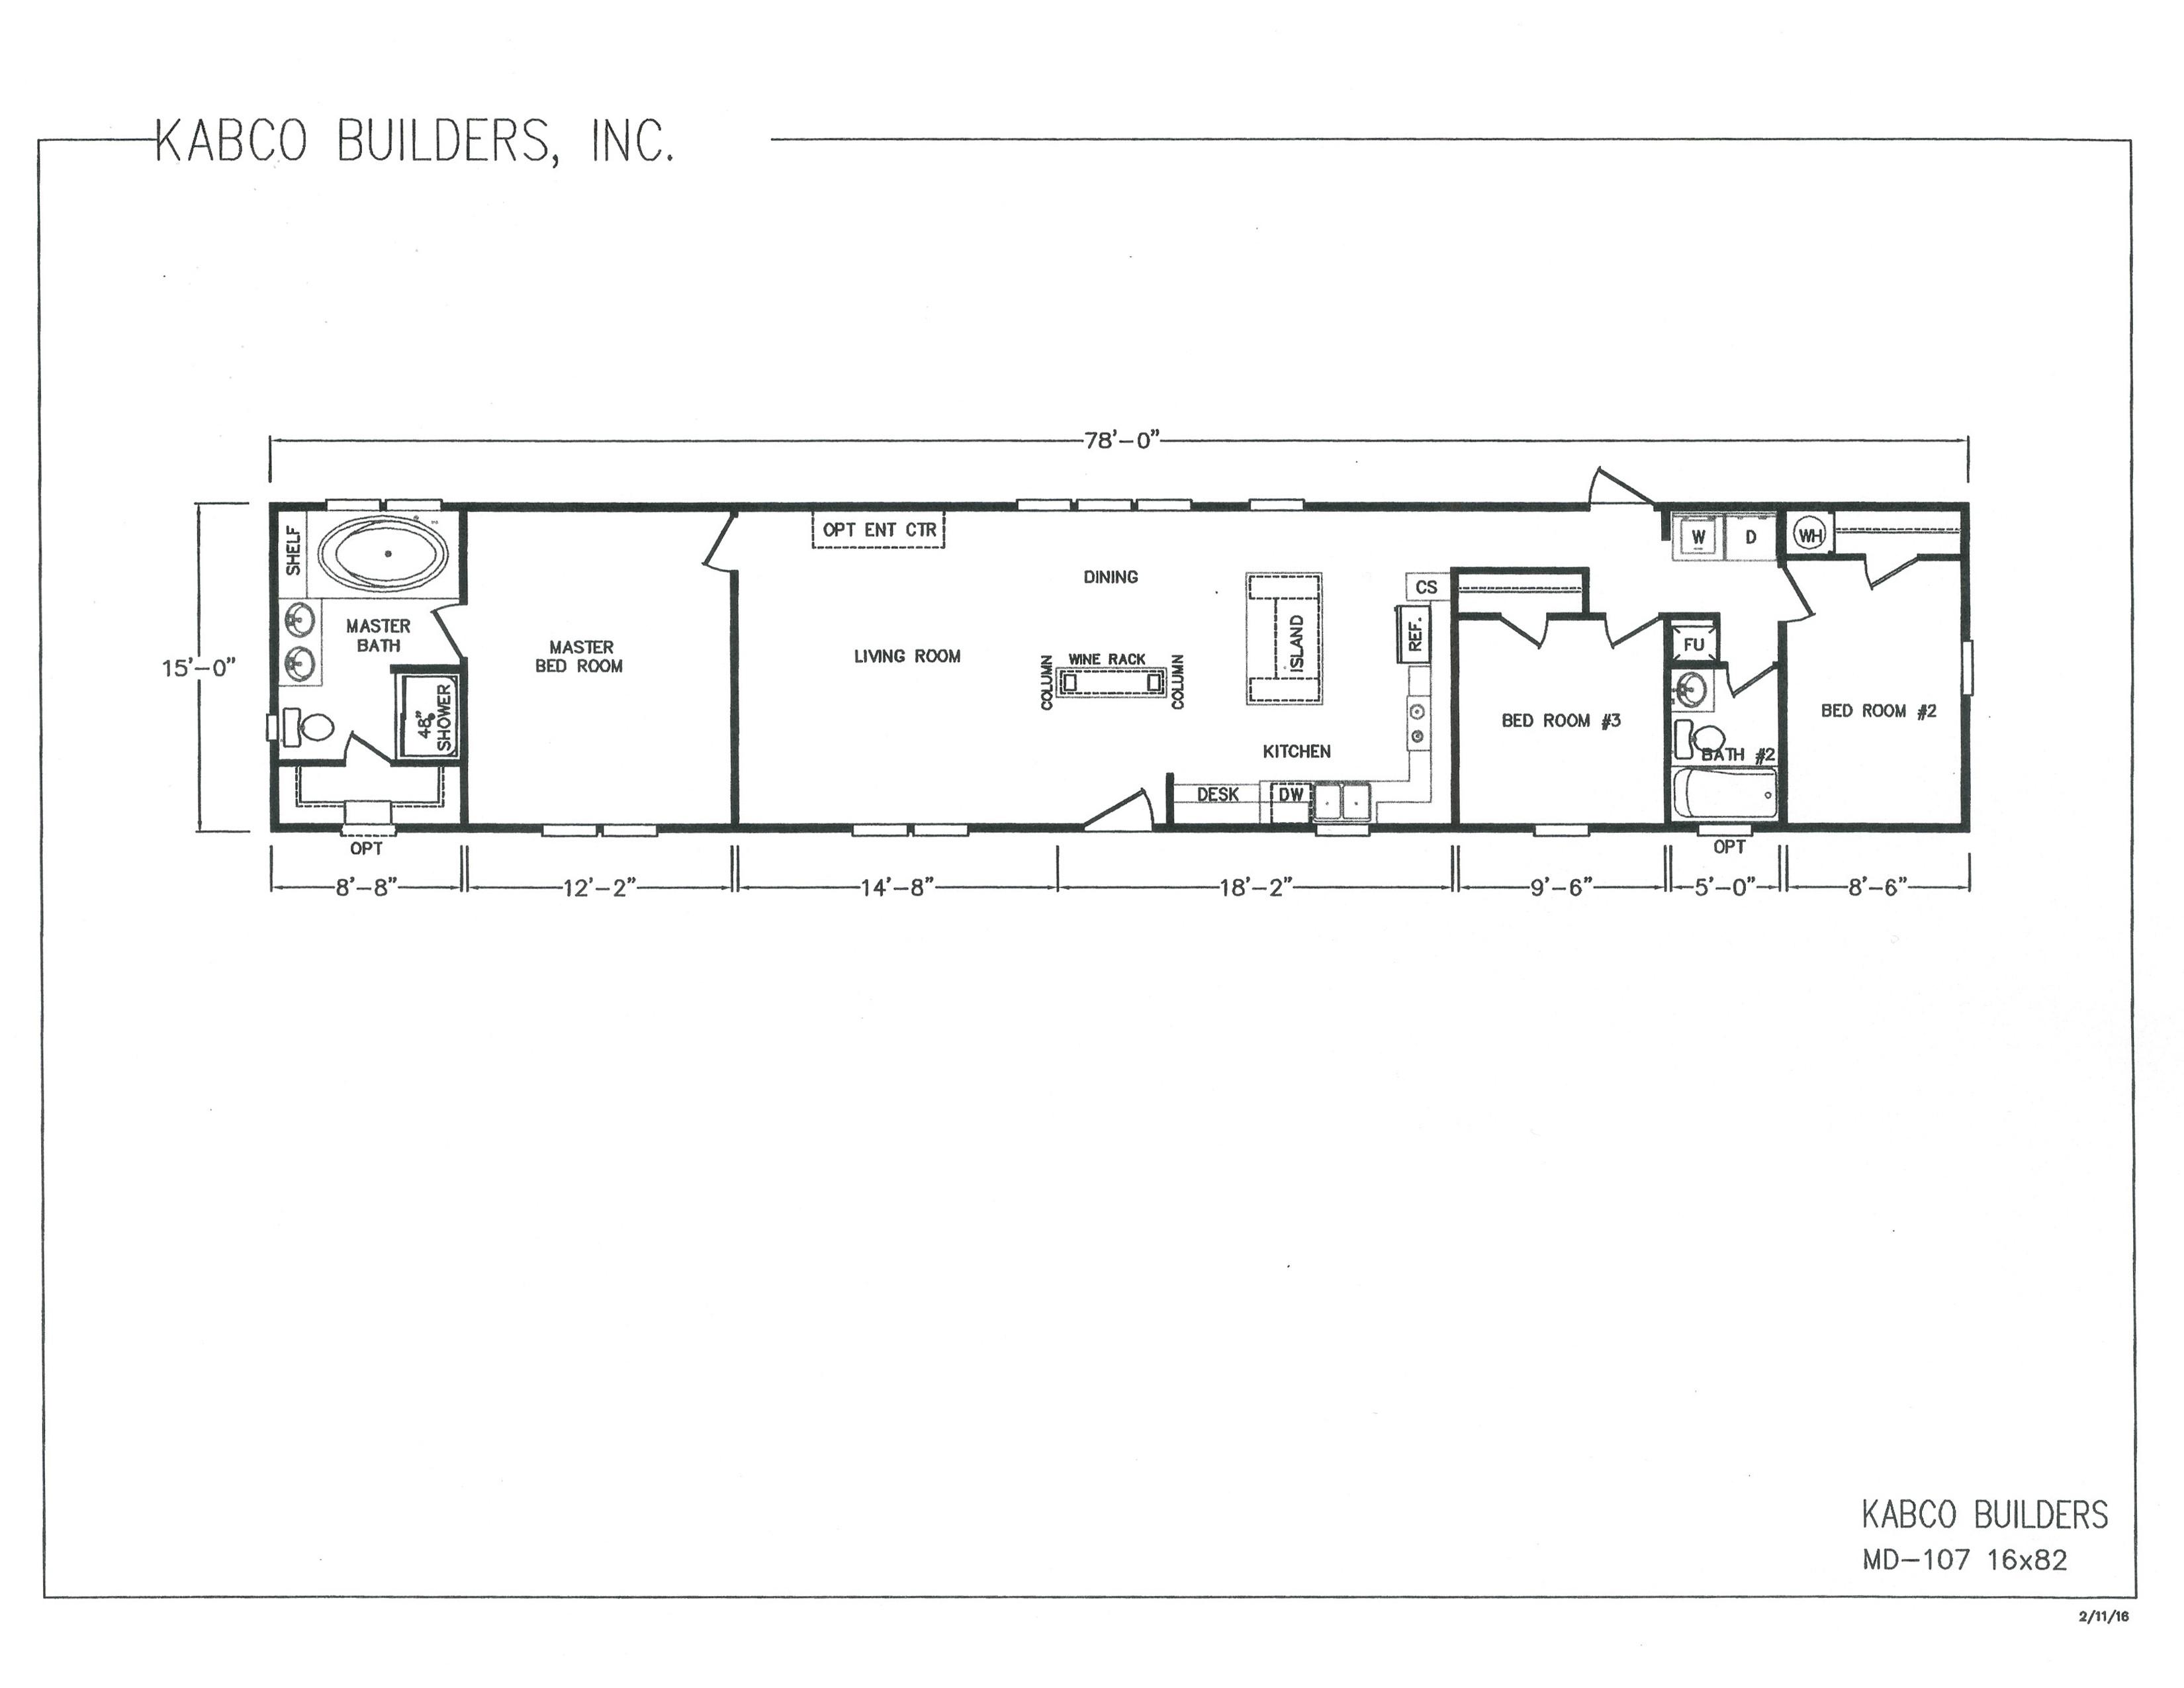 Kabco builders singles wide Yess Home Center of Vidalia